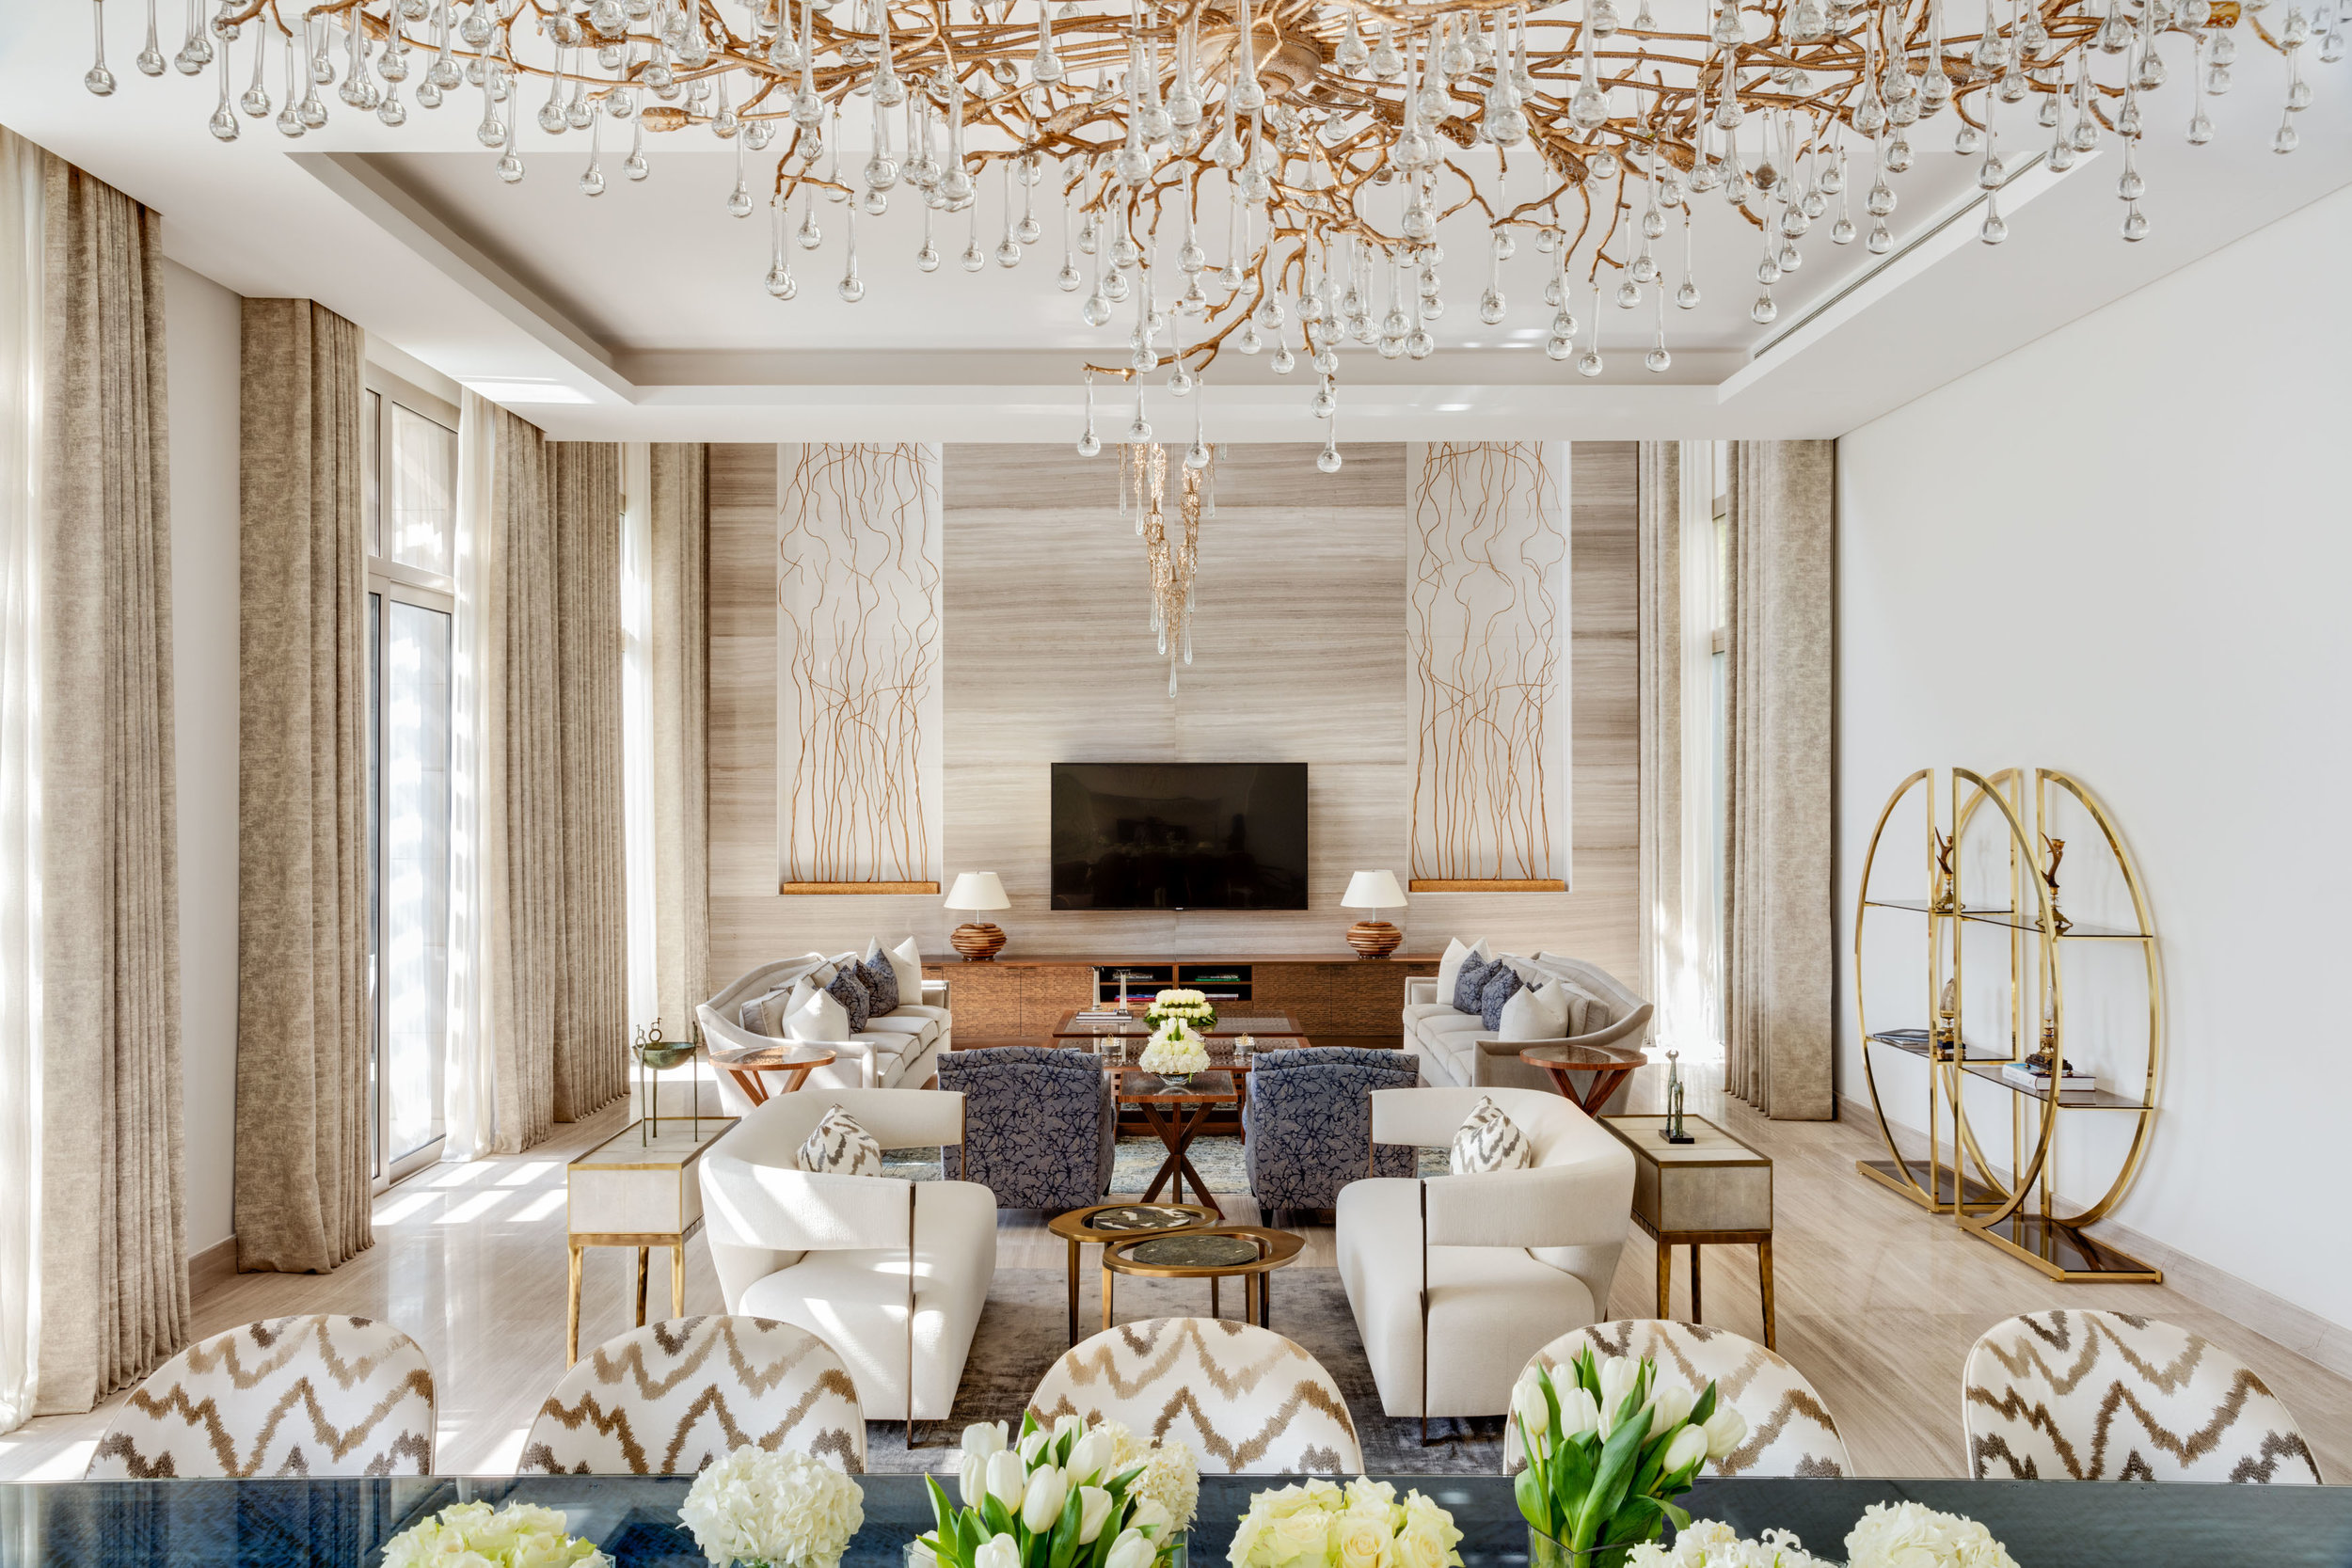 Family Salon - Middle East Villa